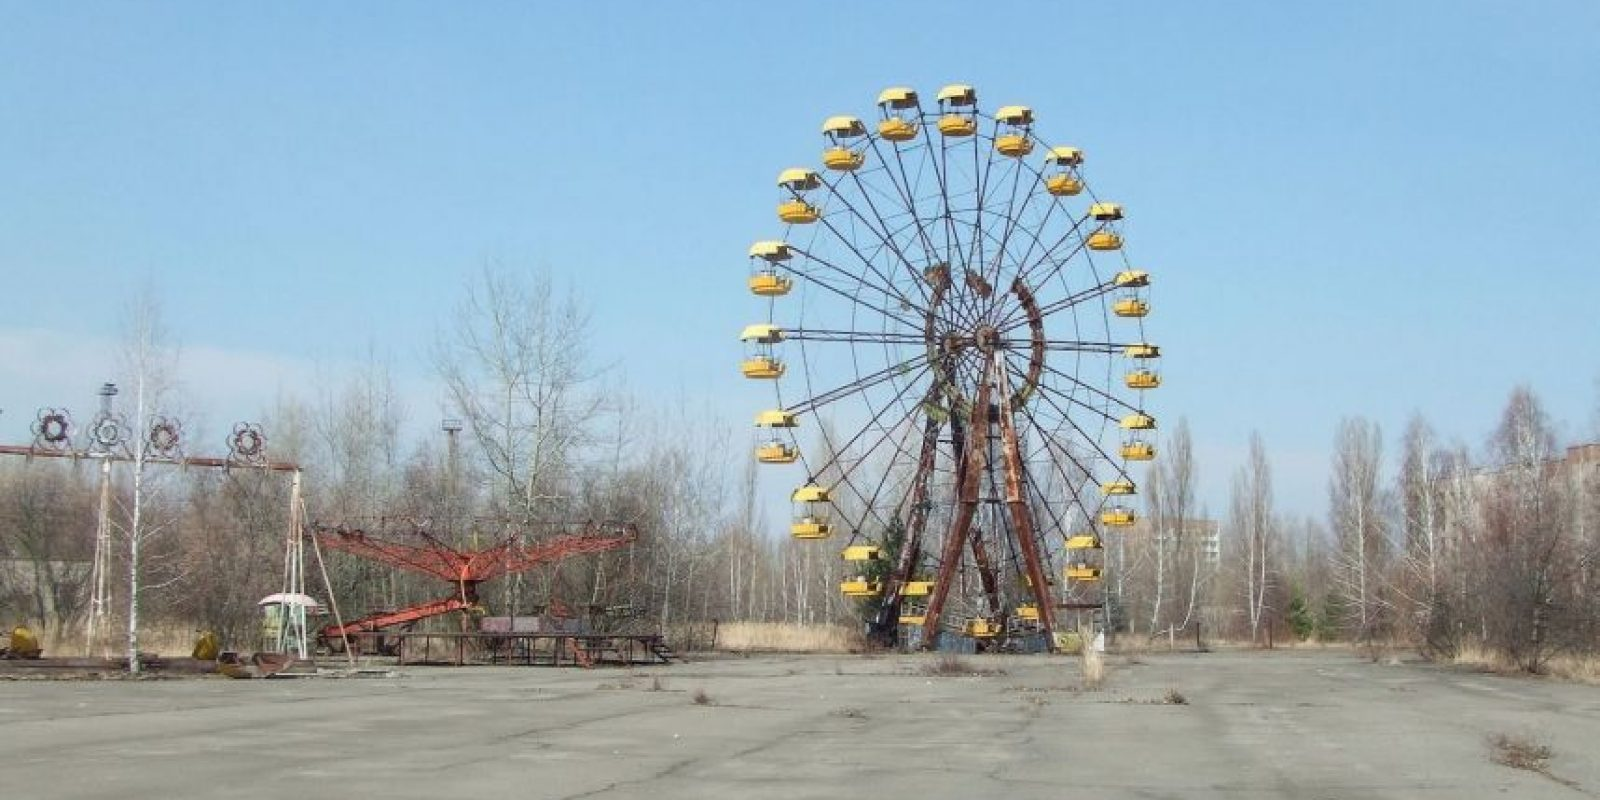 Wonderland Foto:Wikimedia